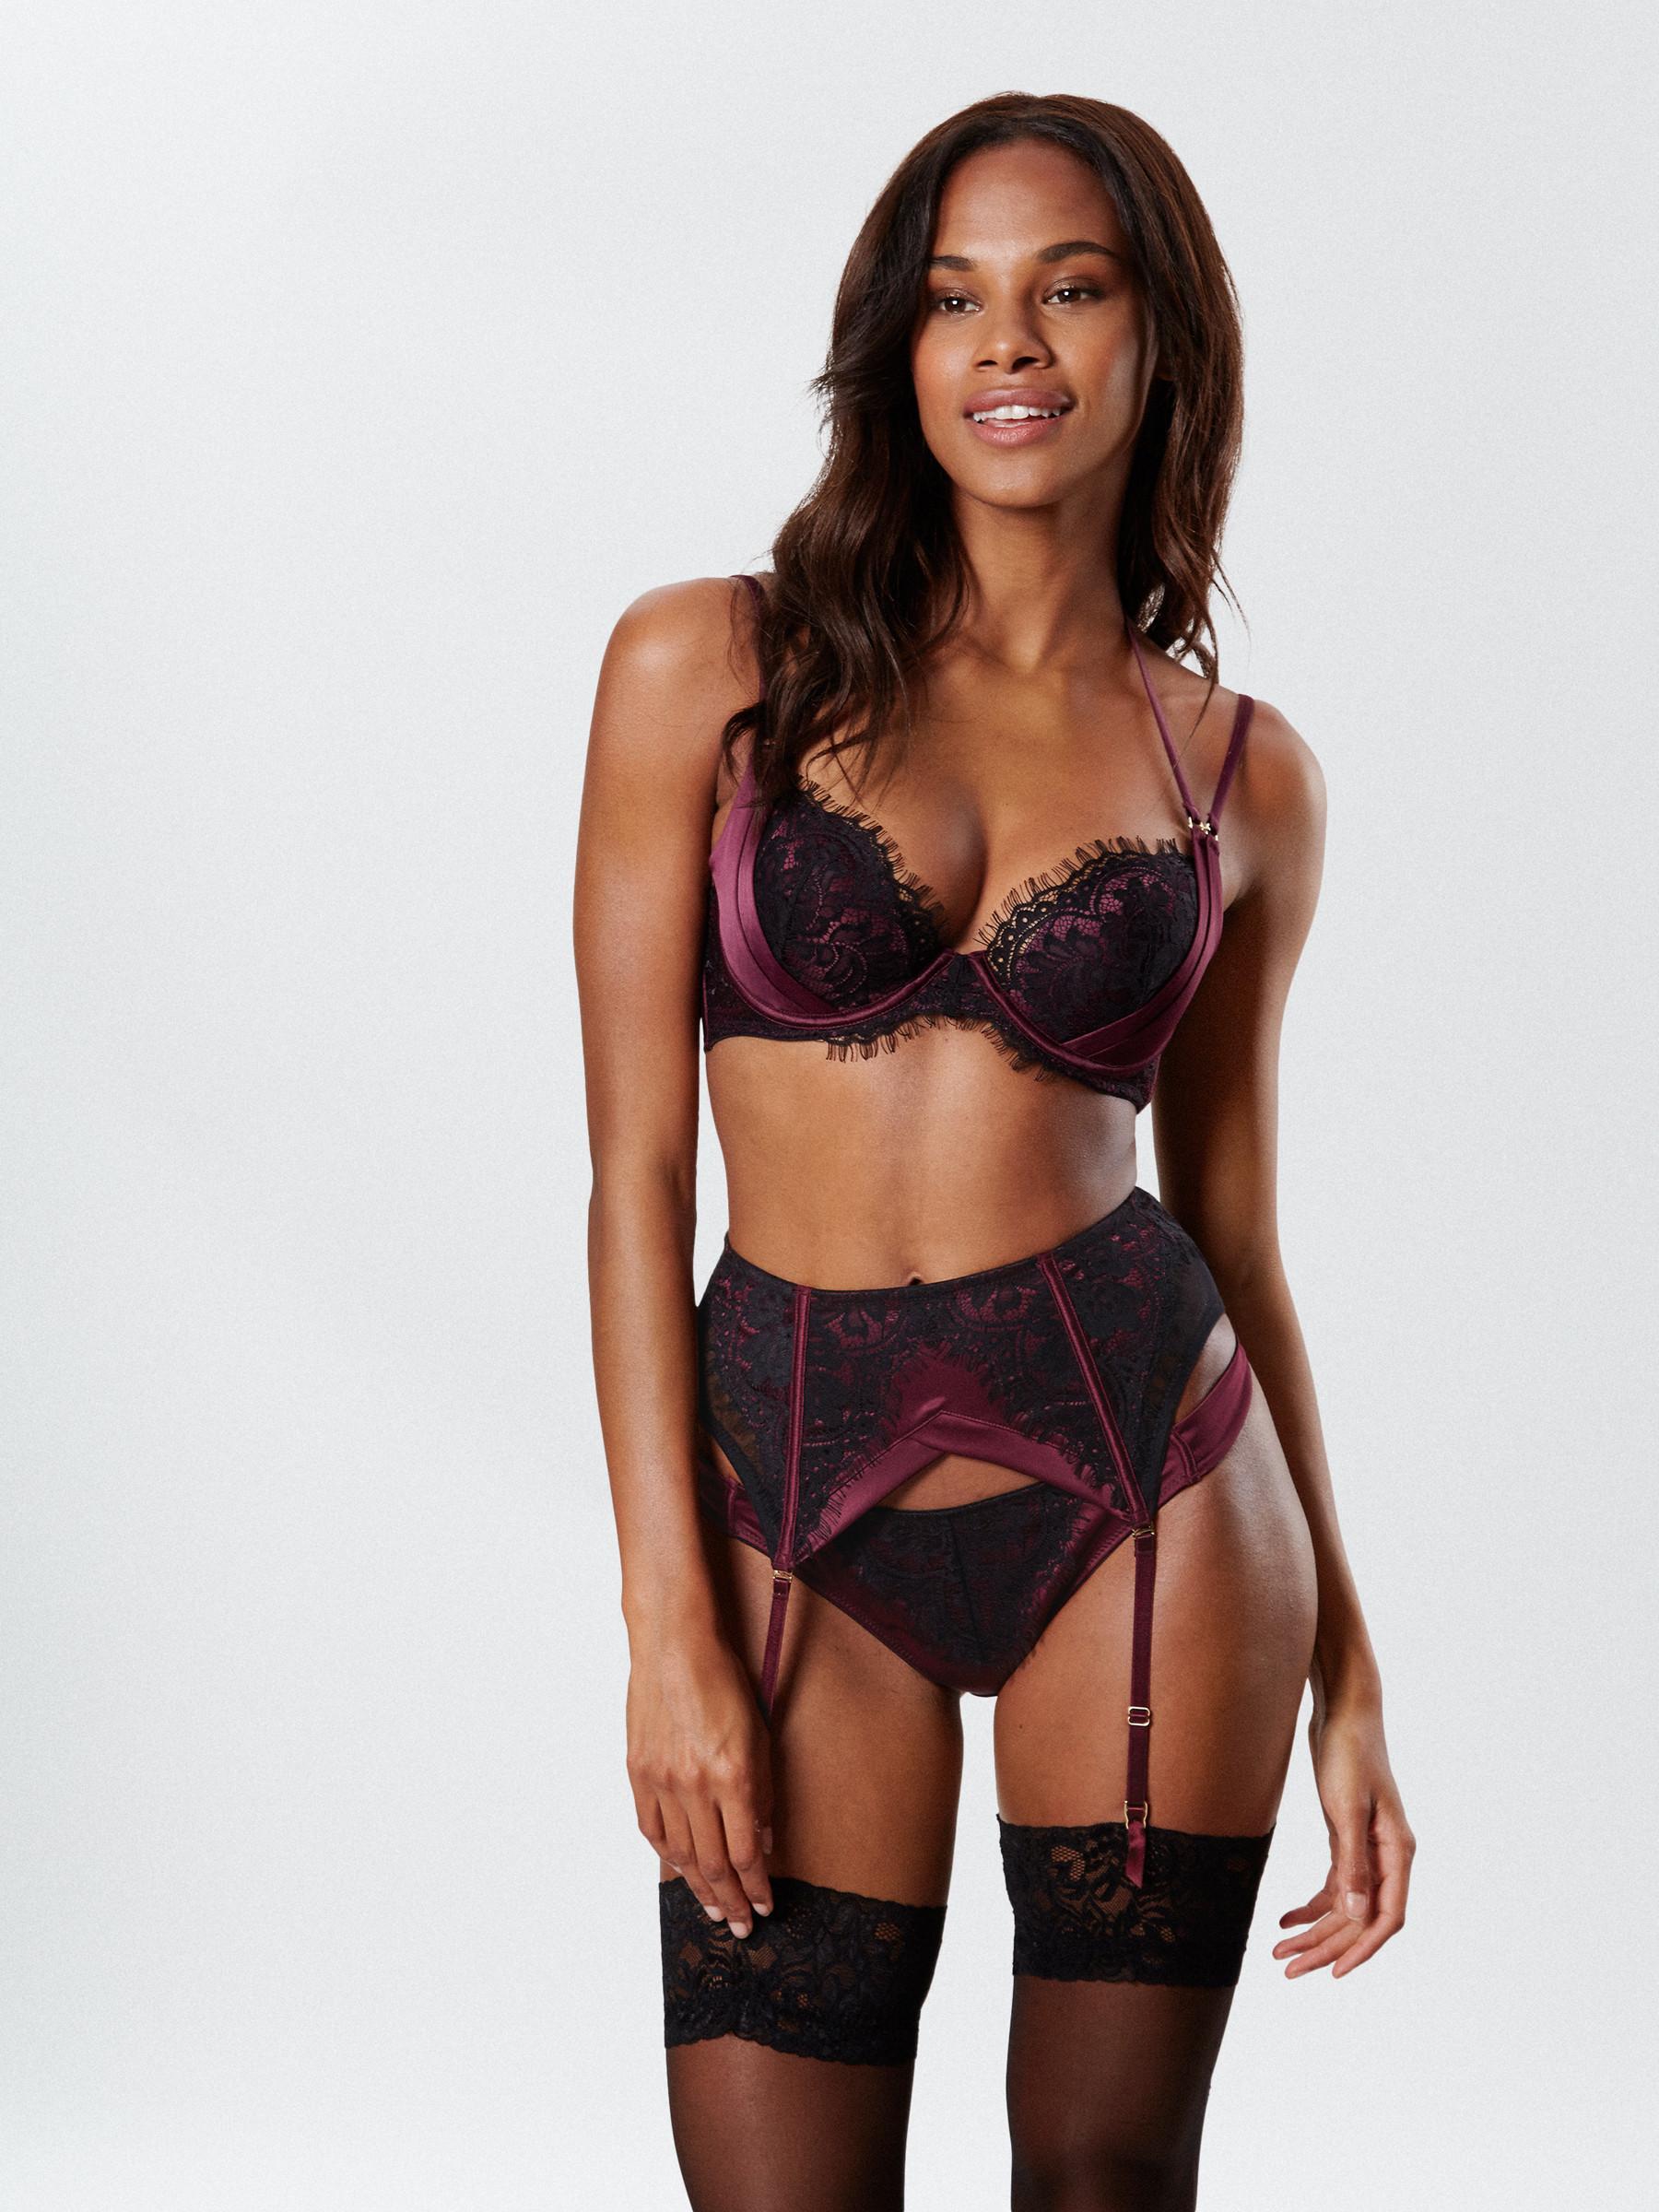 4498b6b01359d Ann Summers Womens Angeline Plunge Bra Satin Lace Sexy Lingerie Underwear